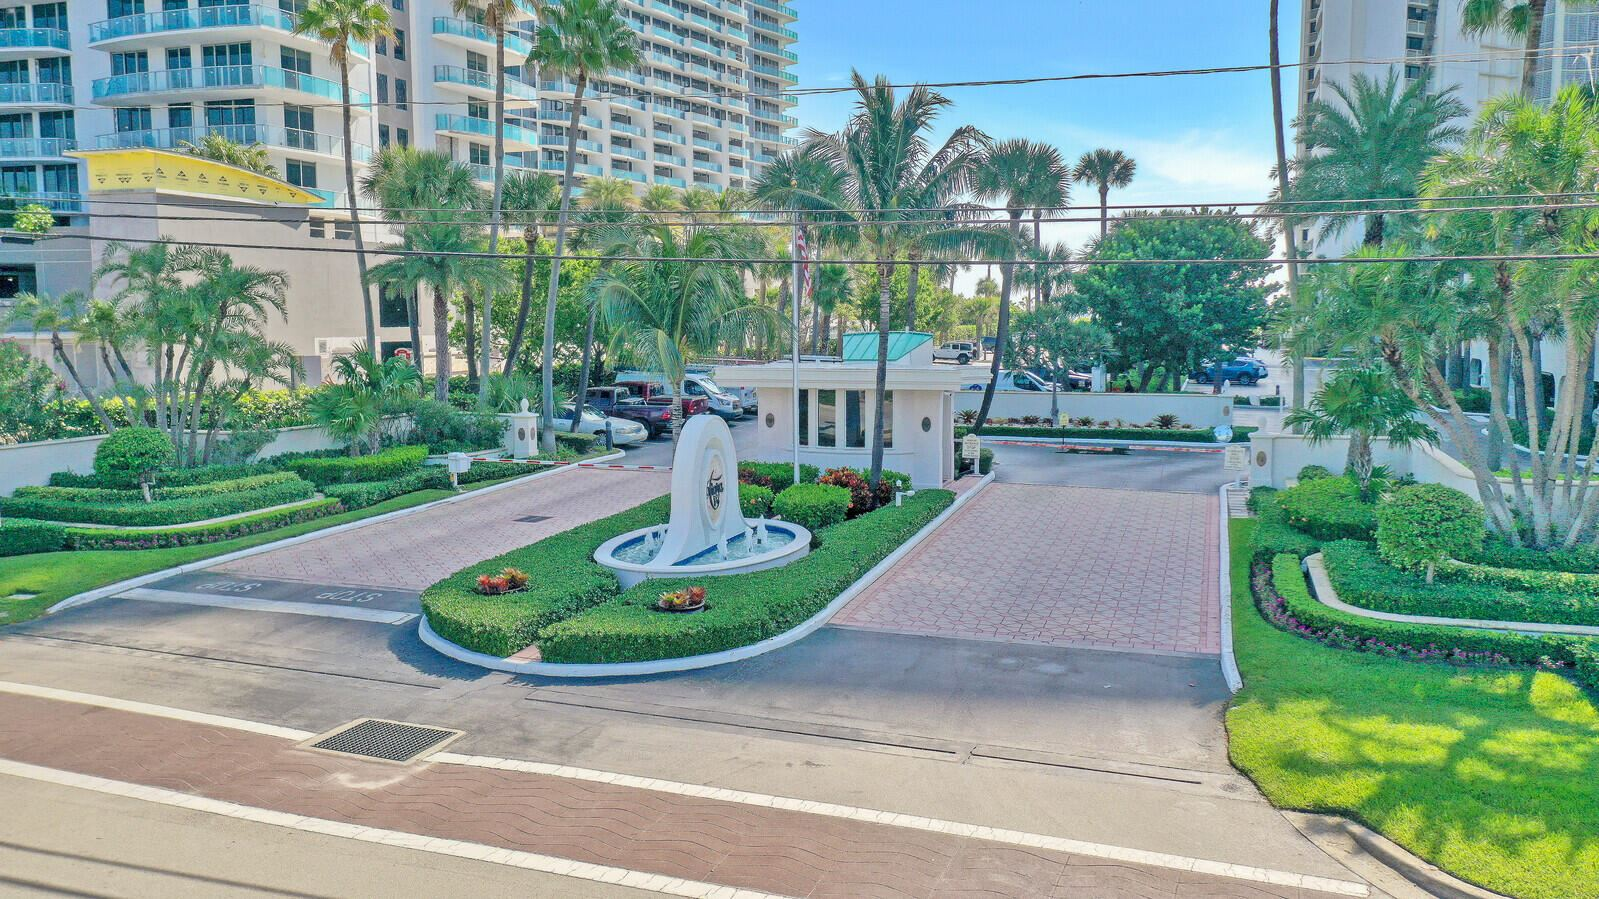 Photo for 3000 N Ocean Drive #39-H&G, Singer Island, FL 33404 (MLS # RX-10744438)